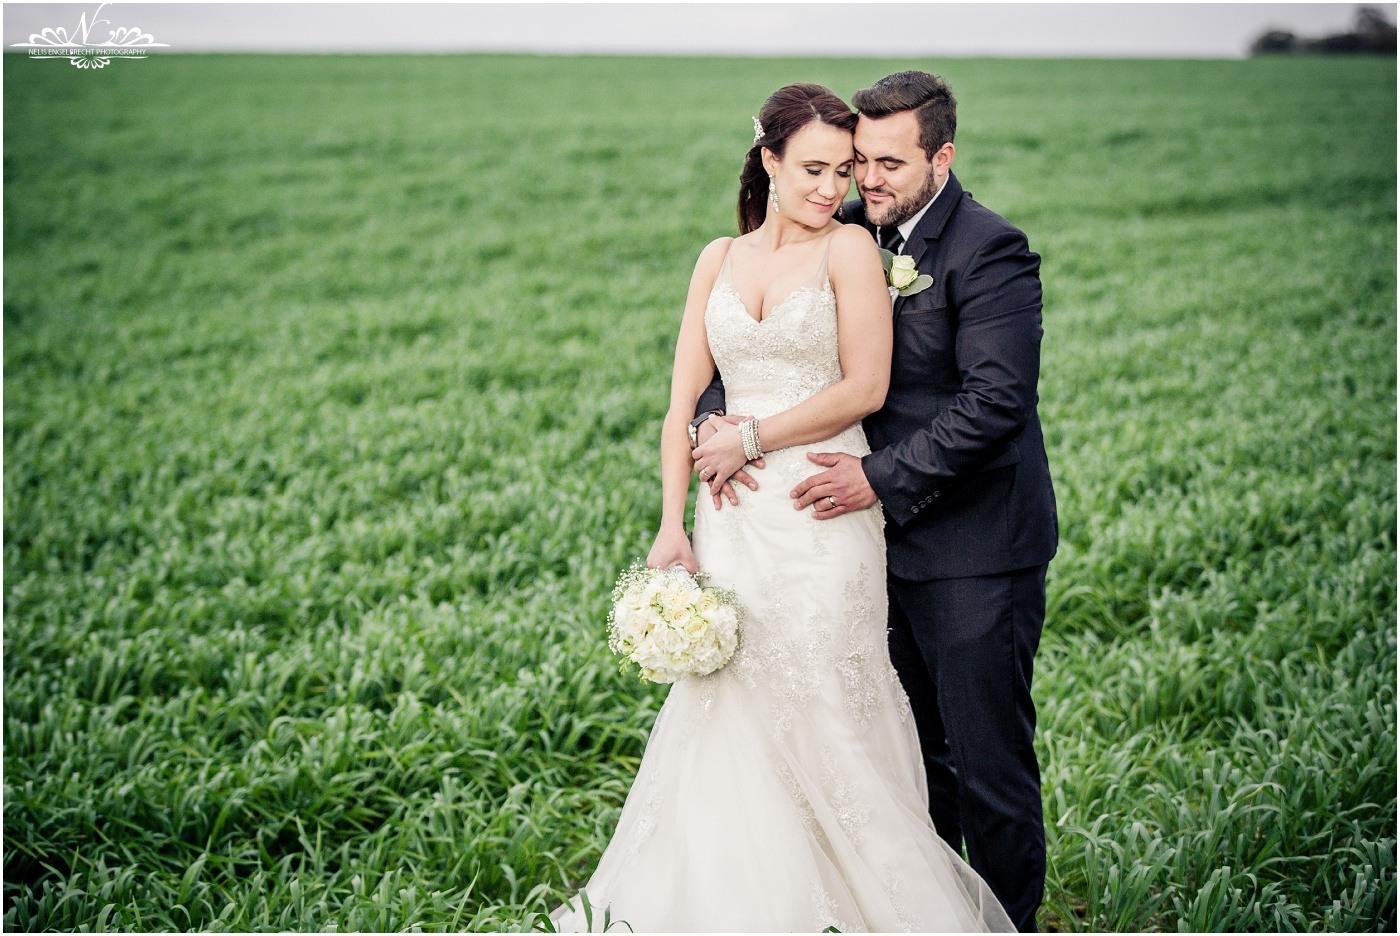 Eensgezind-Wedding-Photos-Nelis-Engelbrecht-Photography-122